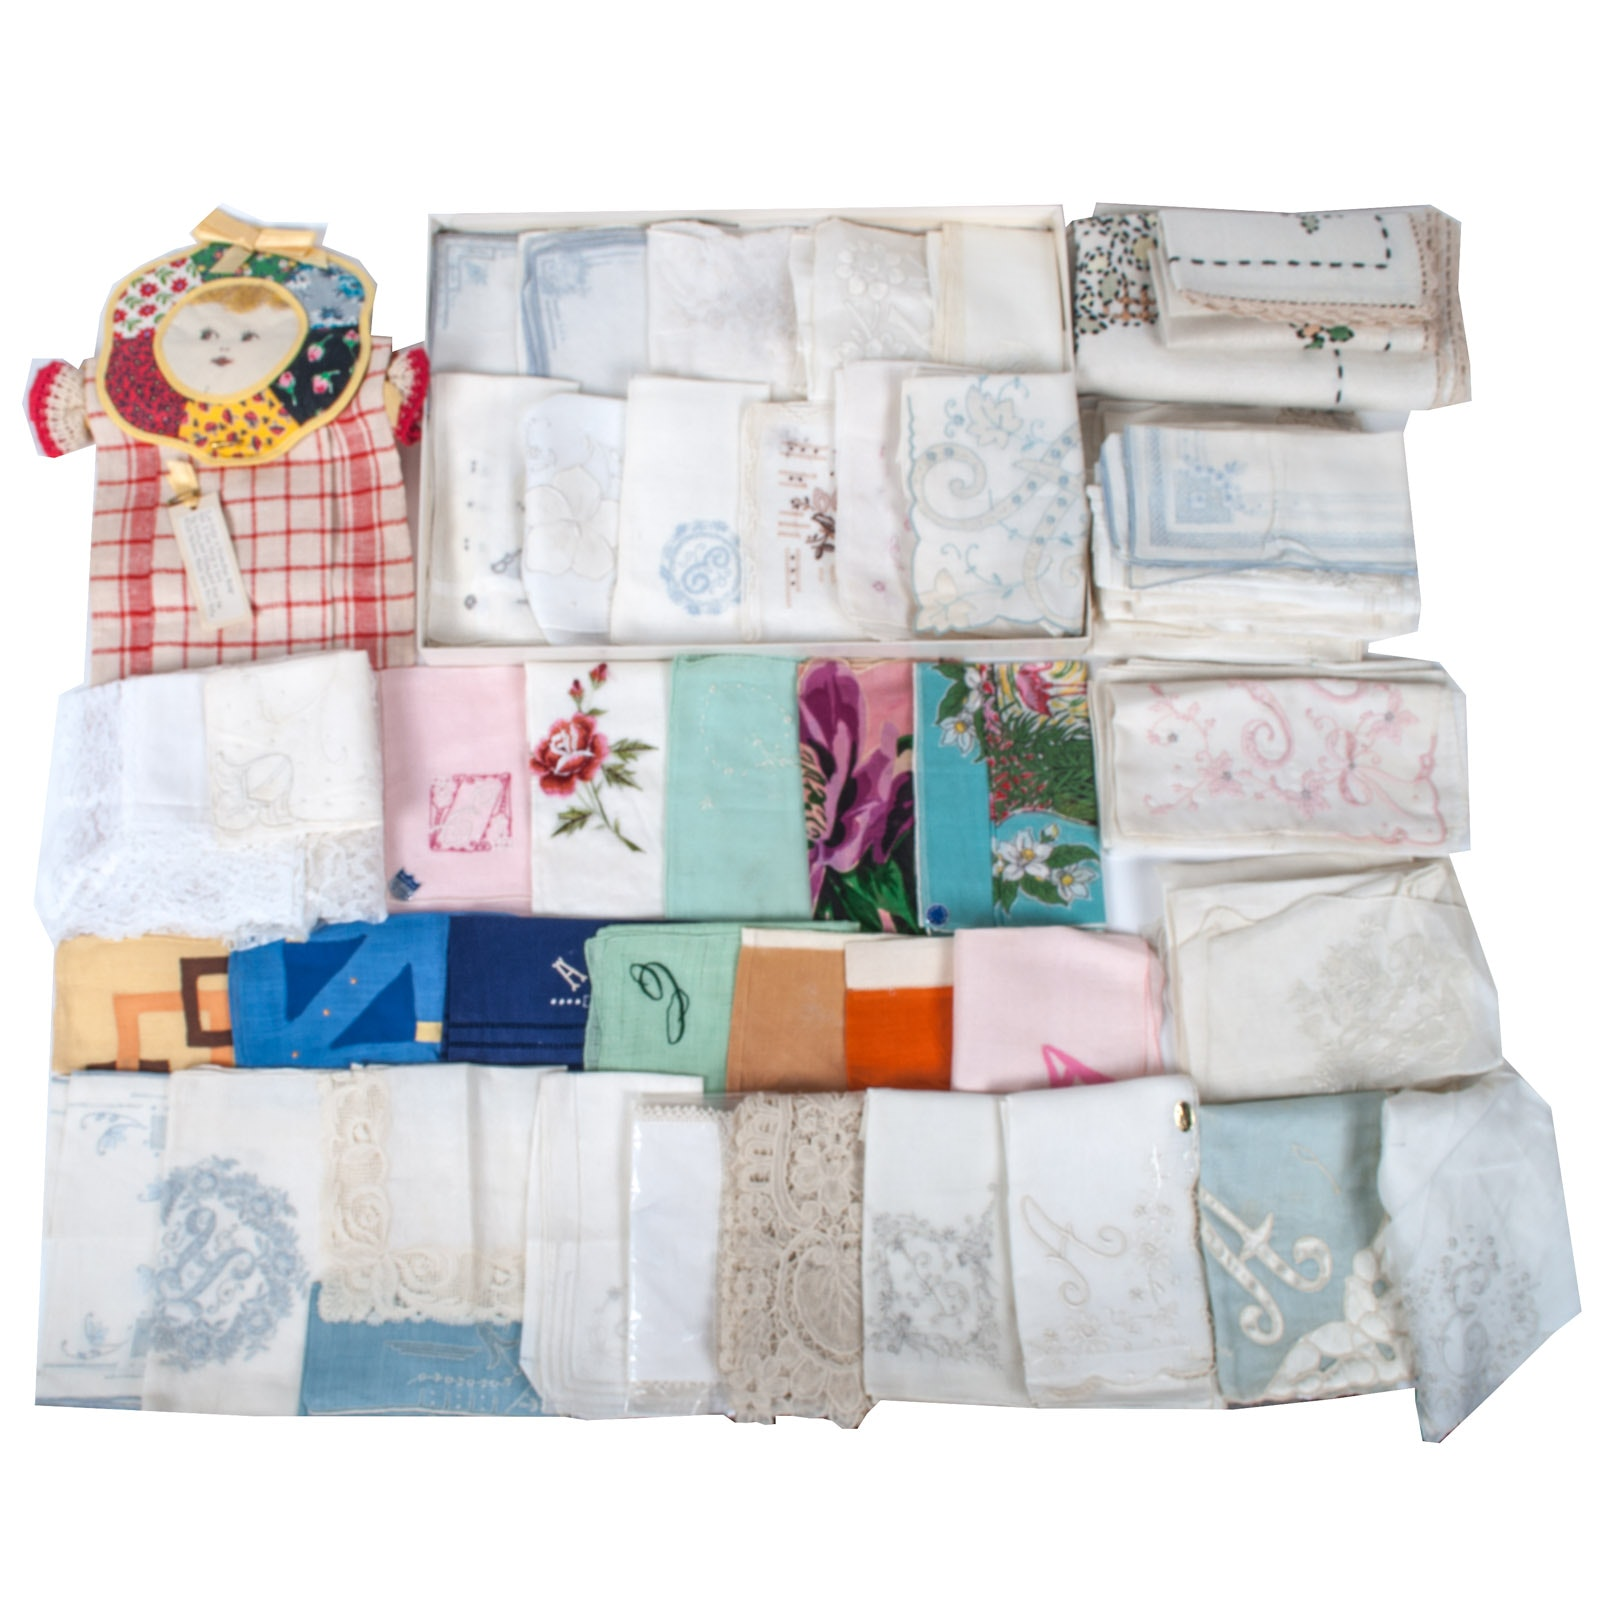 Vintage Linens and Lace Assortment